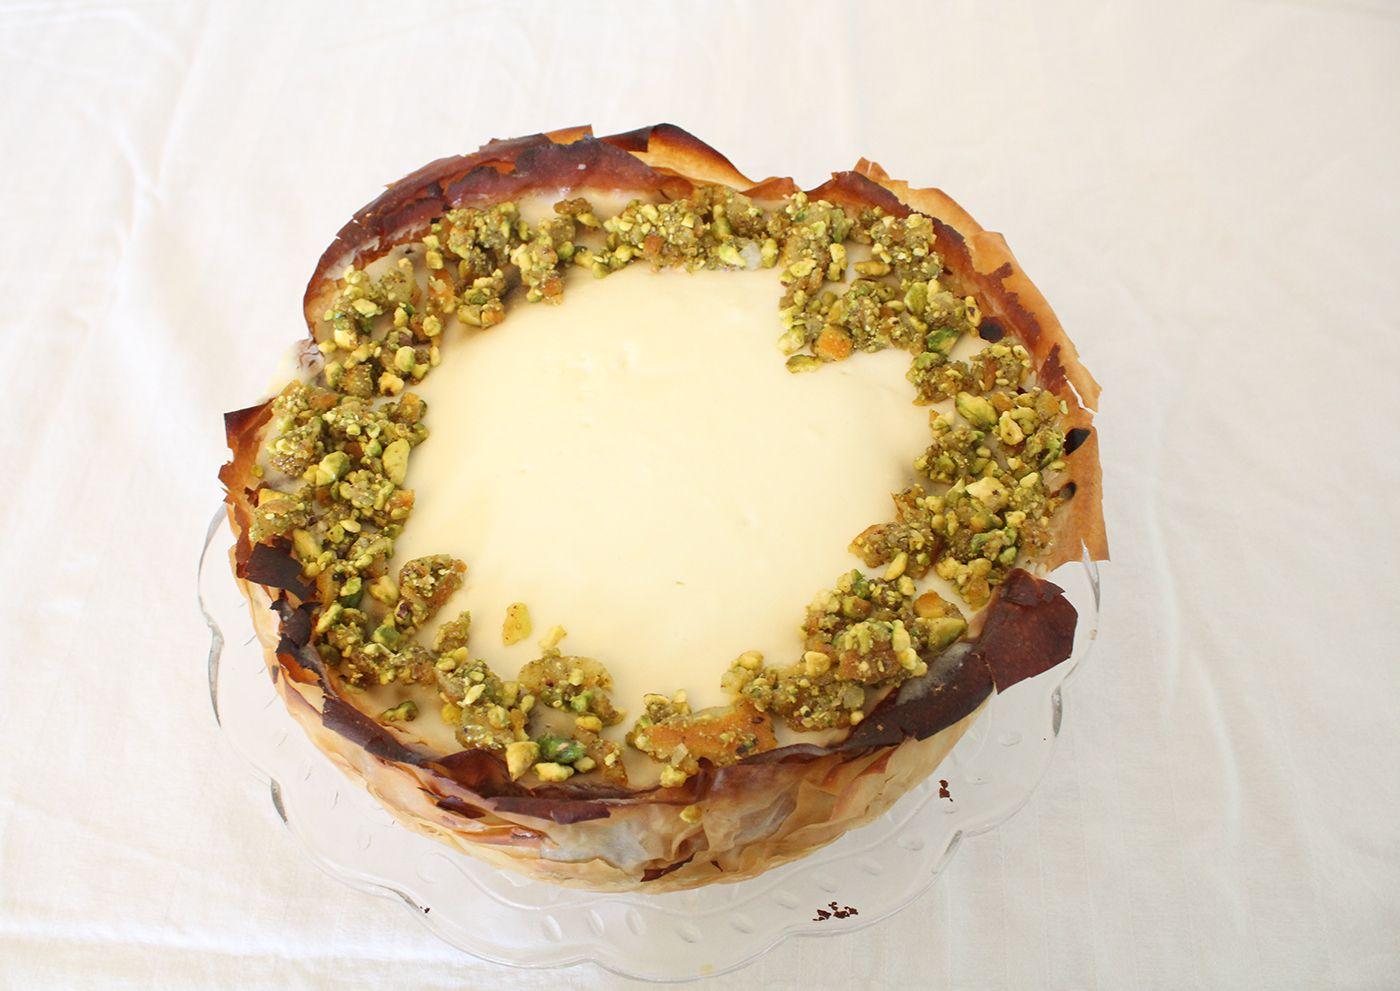 IMG 3328 - עוגות גבינה